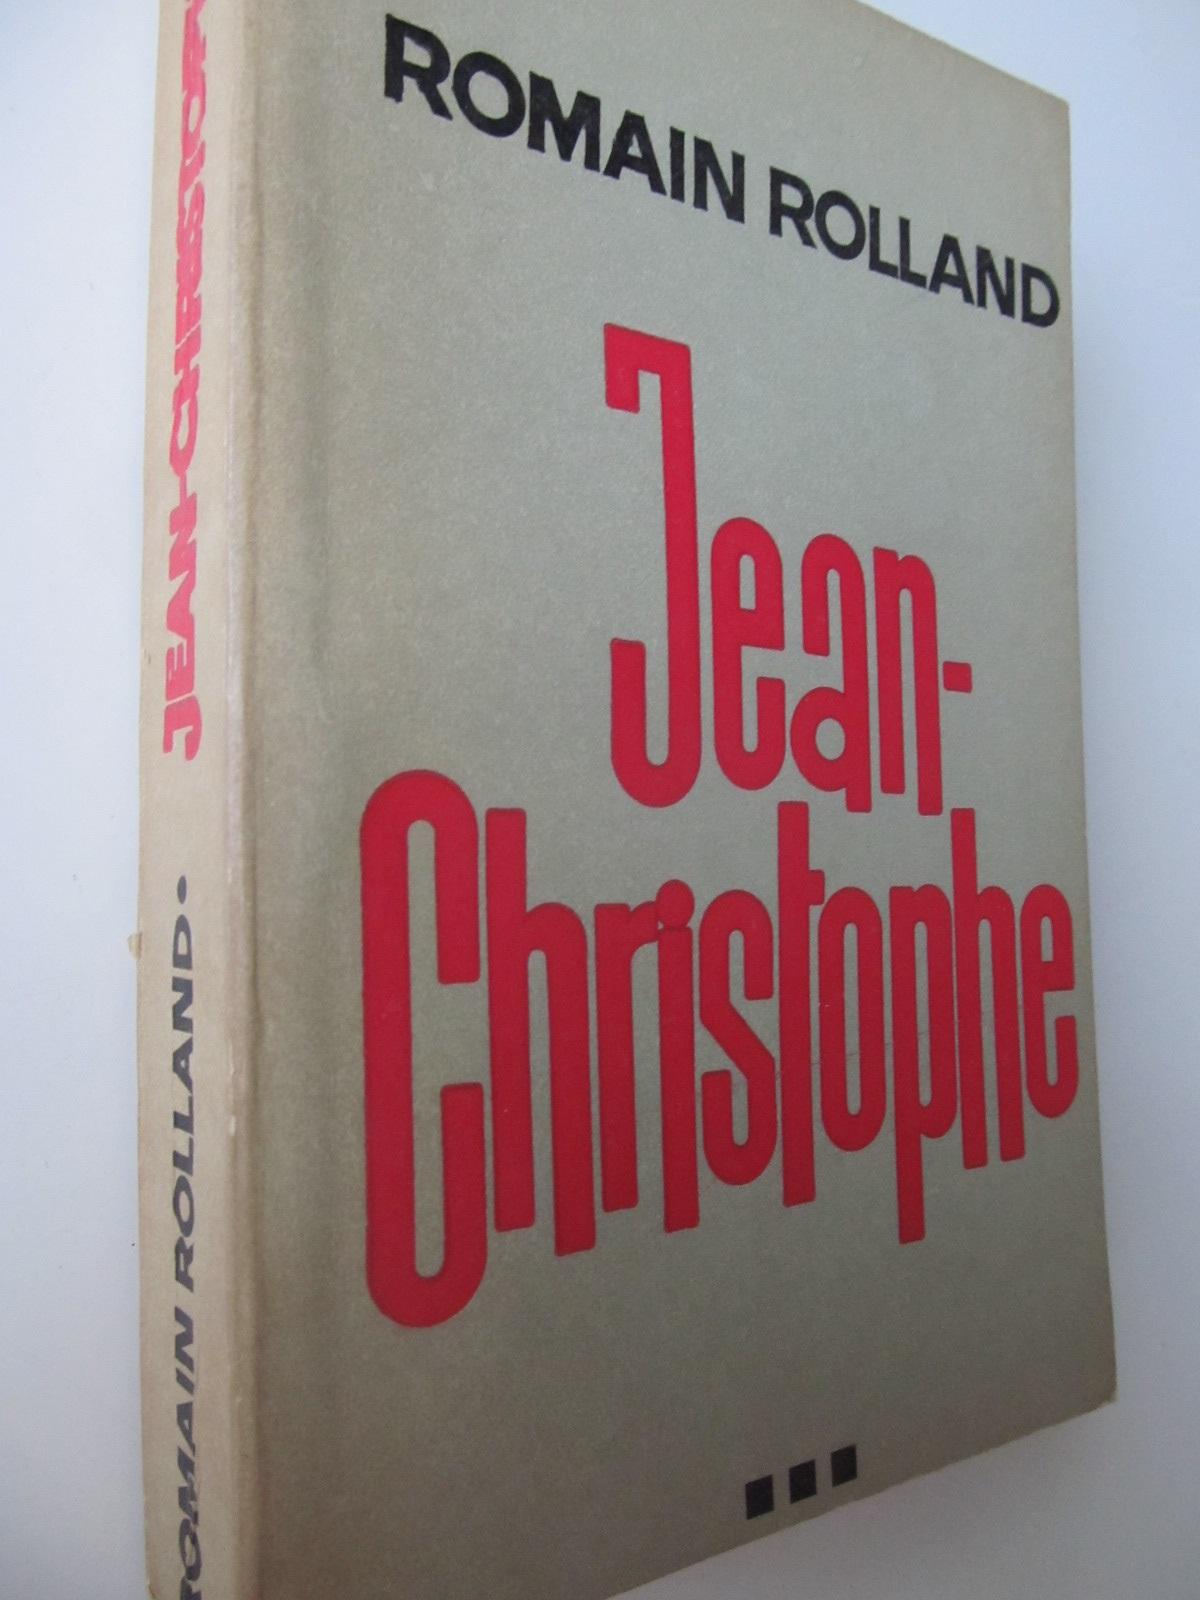 Jean Christophe (vol. 3) - Romain Rolland | Detalii carte